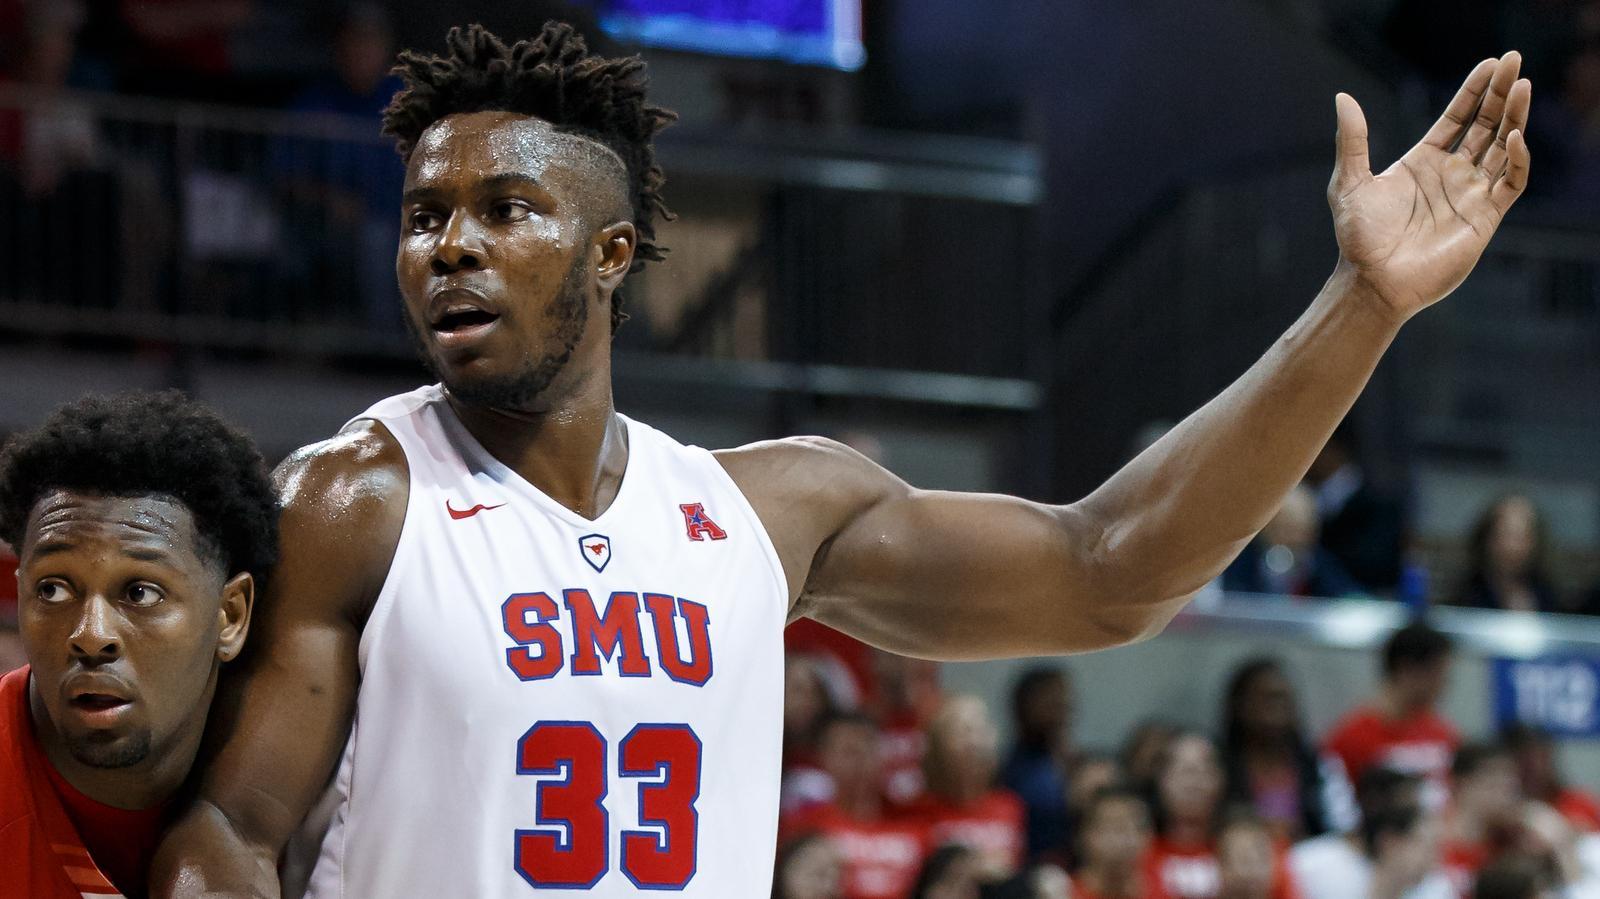 Draft Prospect Watch: Semi Ojeleye of SMU